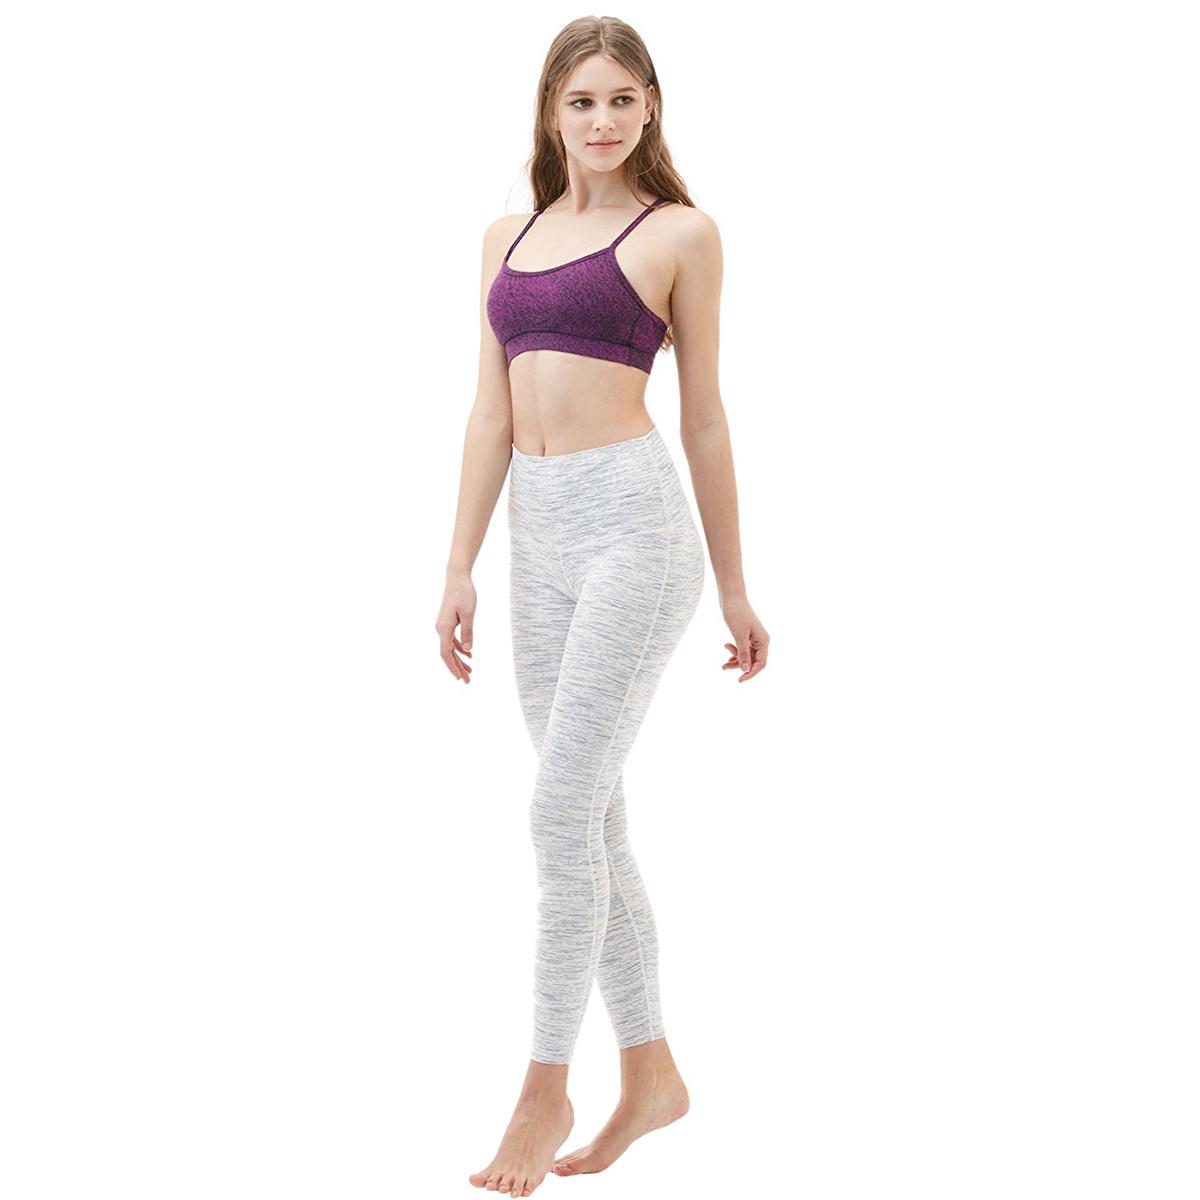 thumbnail 105 - TSLA Tesla FYP42 Women's High-Waisted Ultra-Stretch Tummy Control Yoga Pants